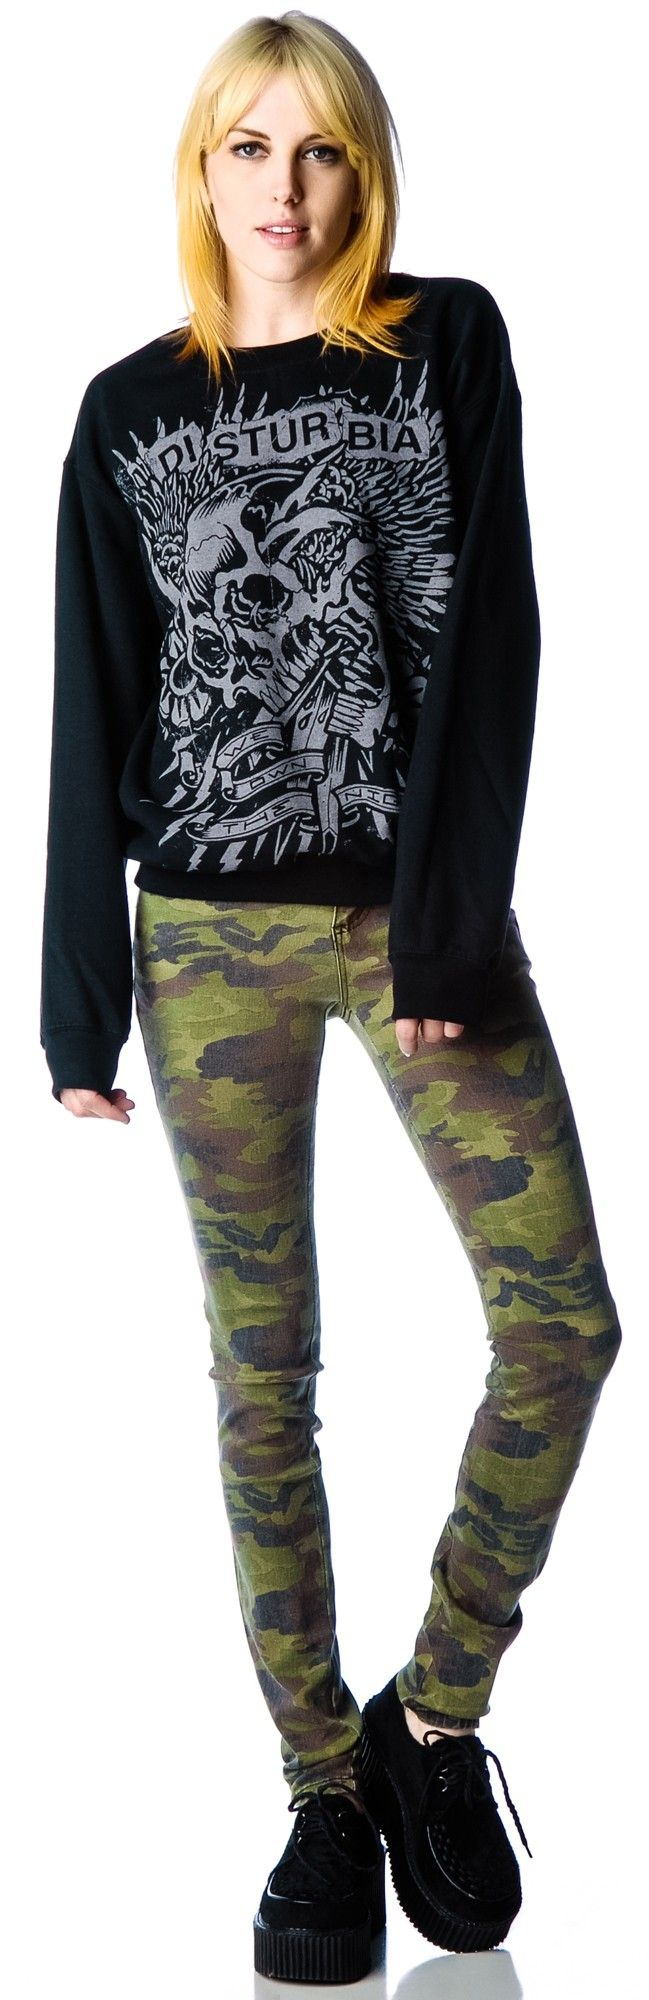 Camo Skinny Jeans #boydollsincamo